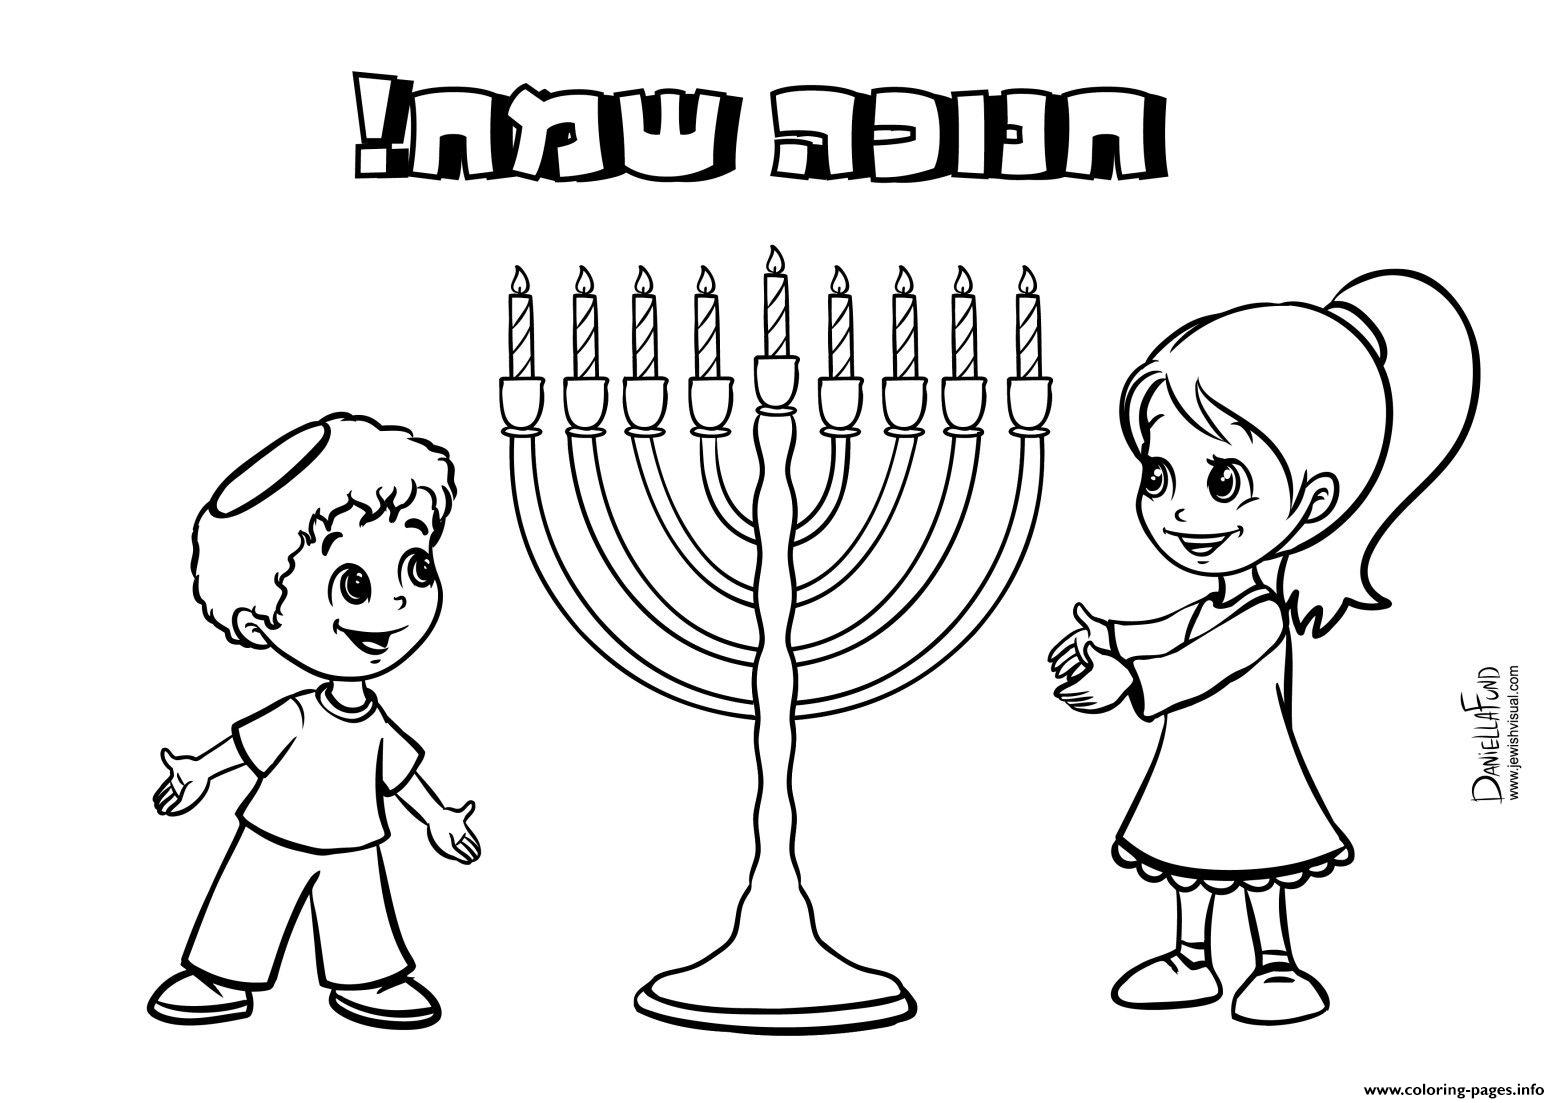 Happy Hanukkah Kids Coloring Pages Printable